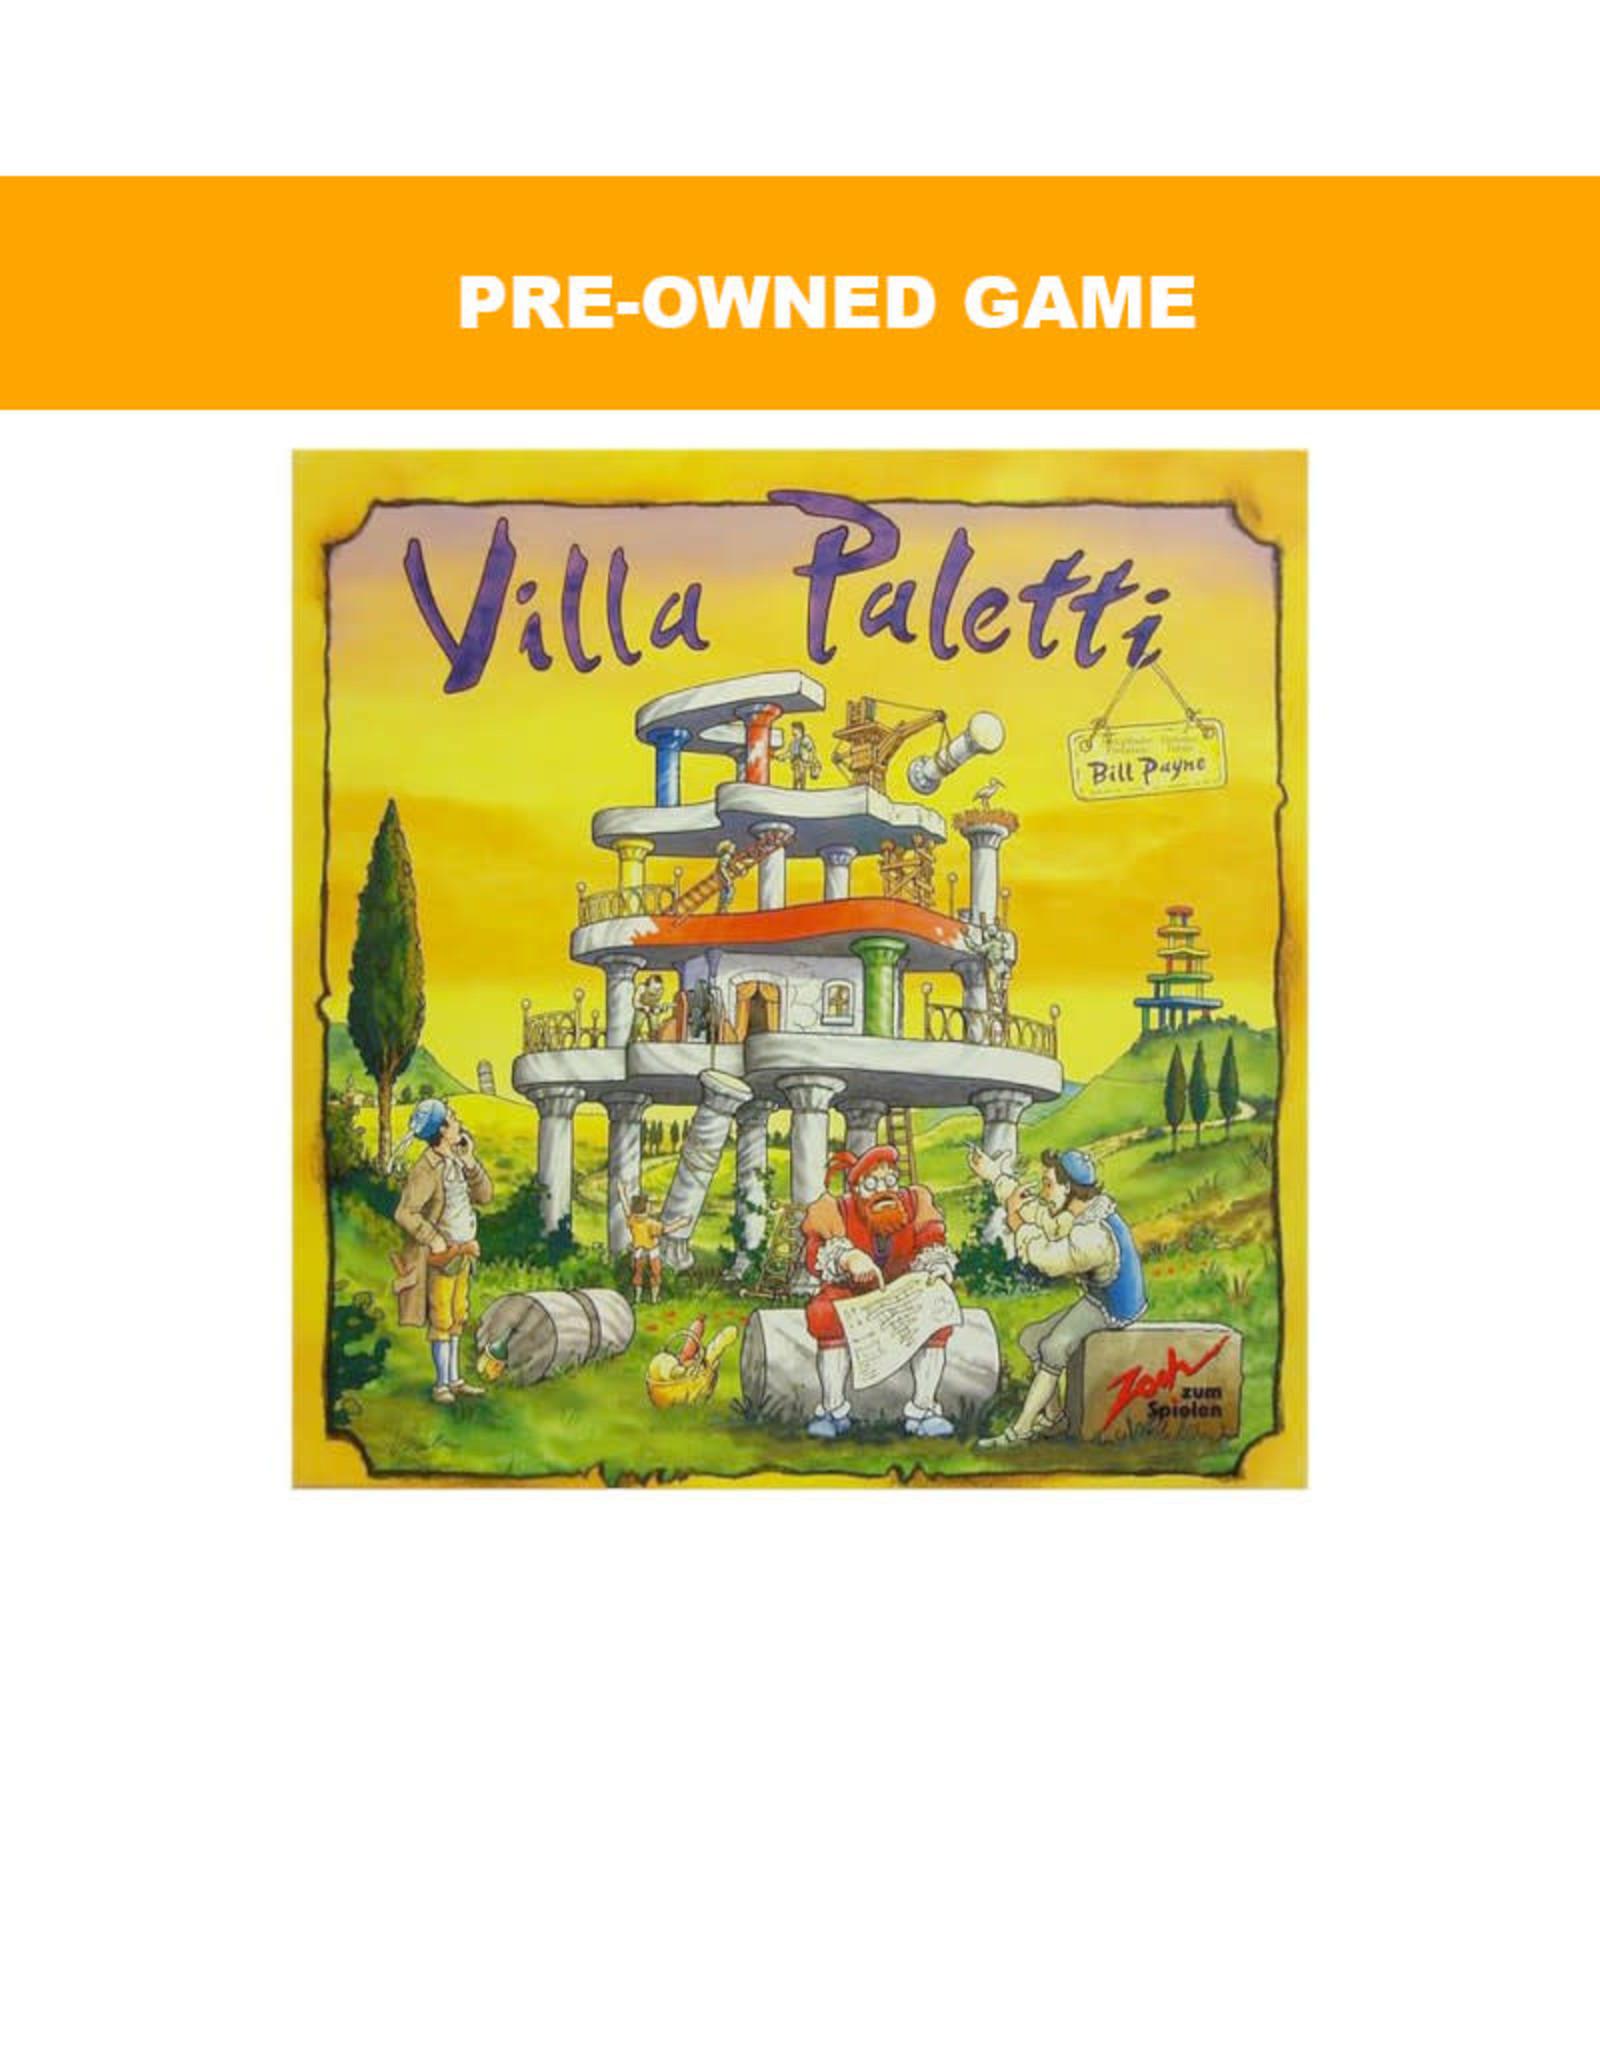 Lion Rampant Games (Pre-Owned Game) Villa Paletti